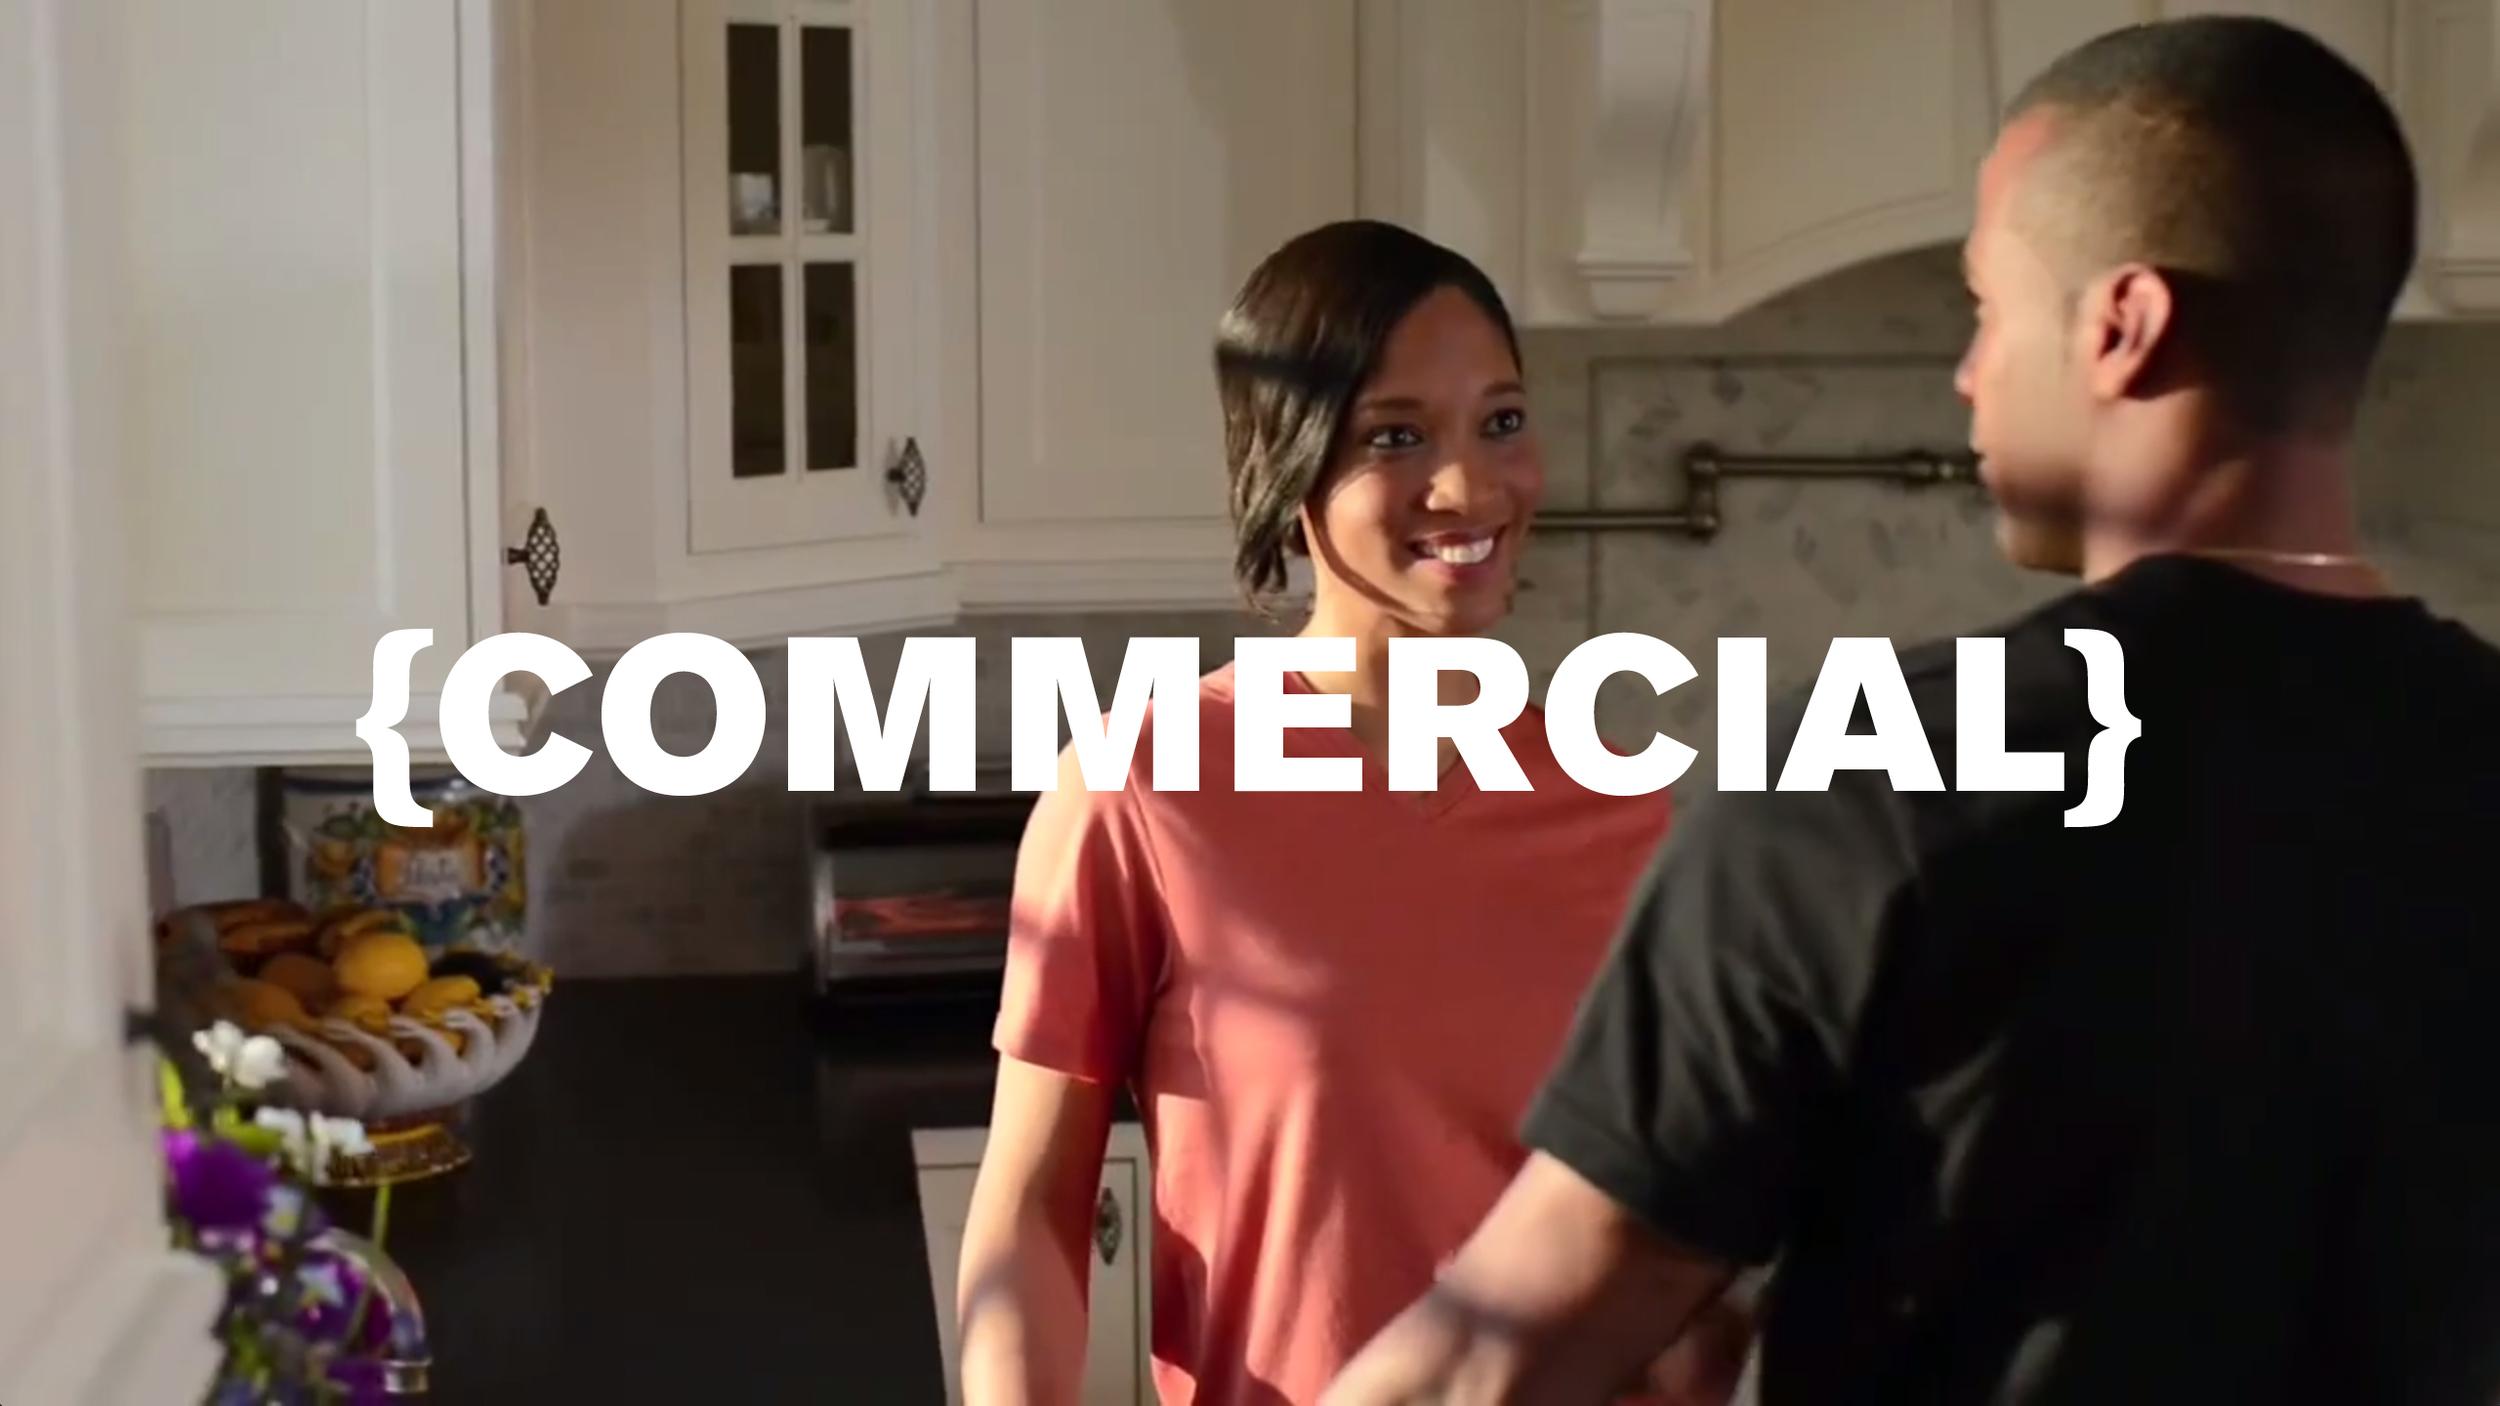 CommercialThumb.jpg